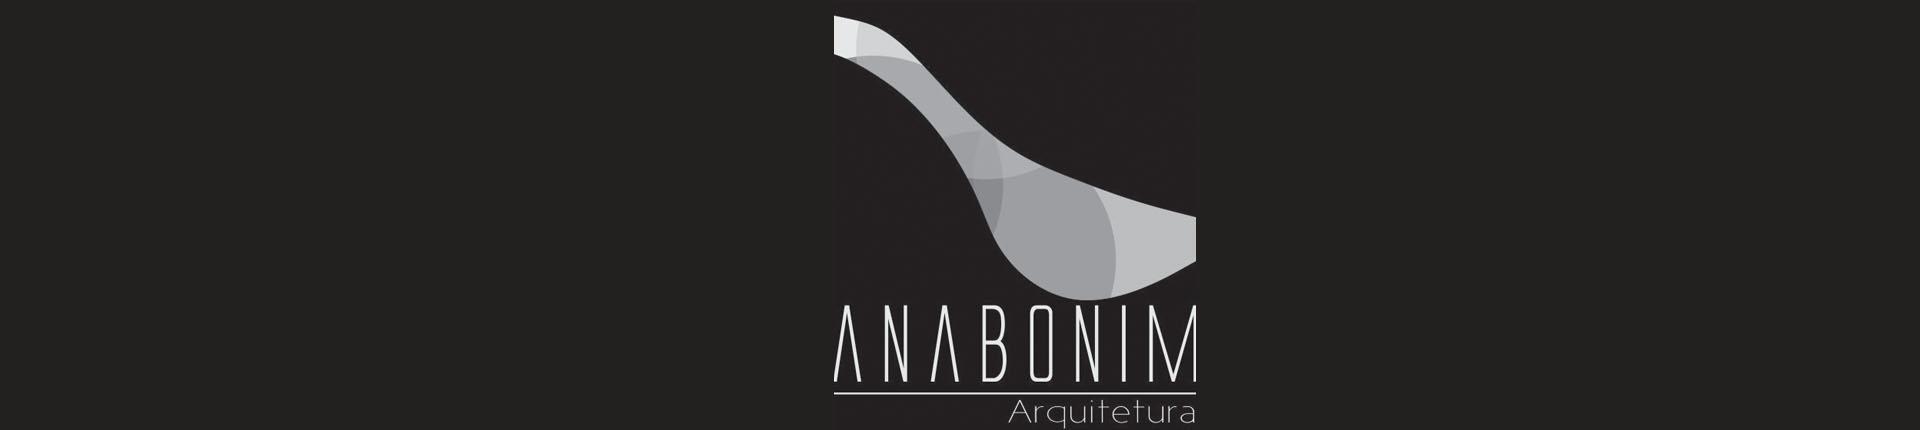 Ana Bonim Studio de Arquitetura